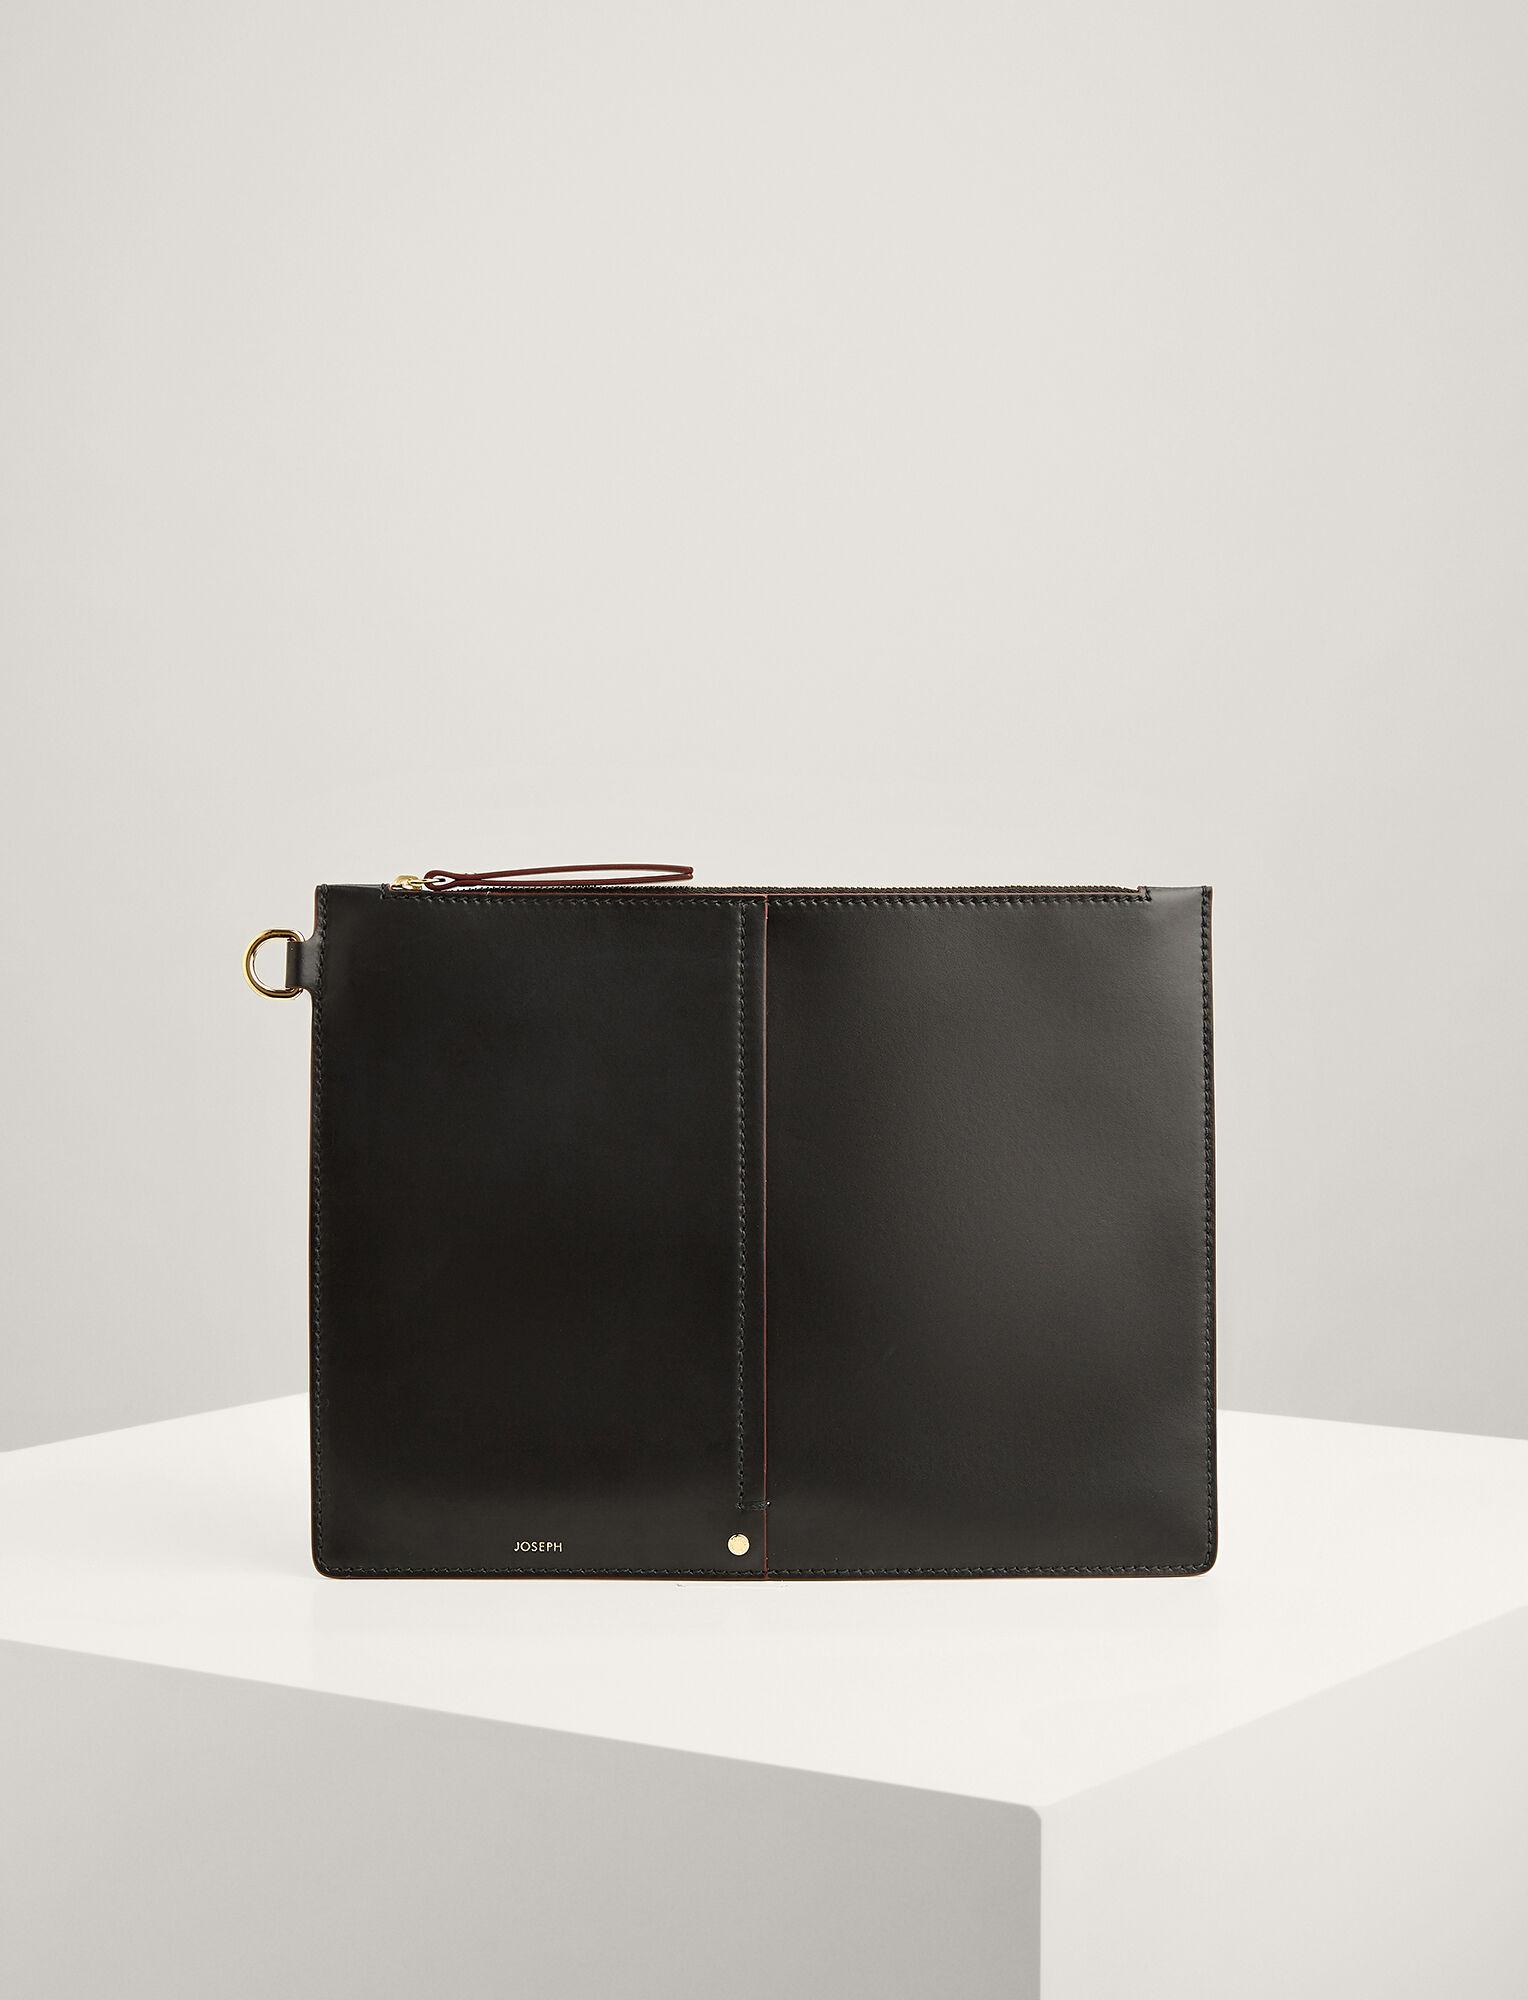 Joseph, Calf Leather XL Pouch, in BLACK